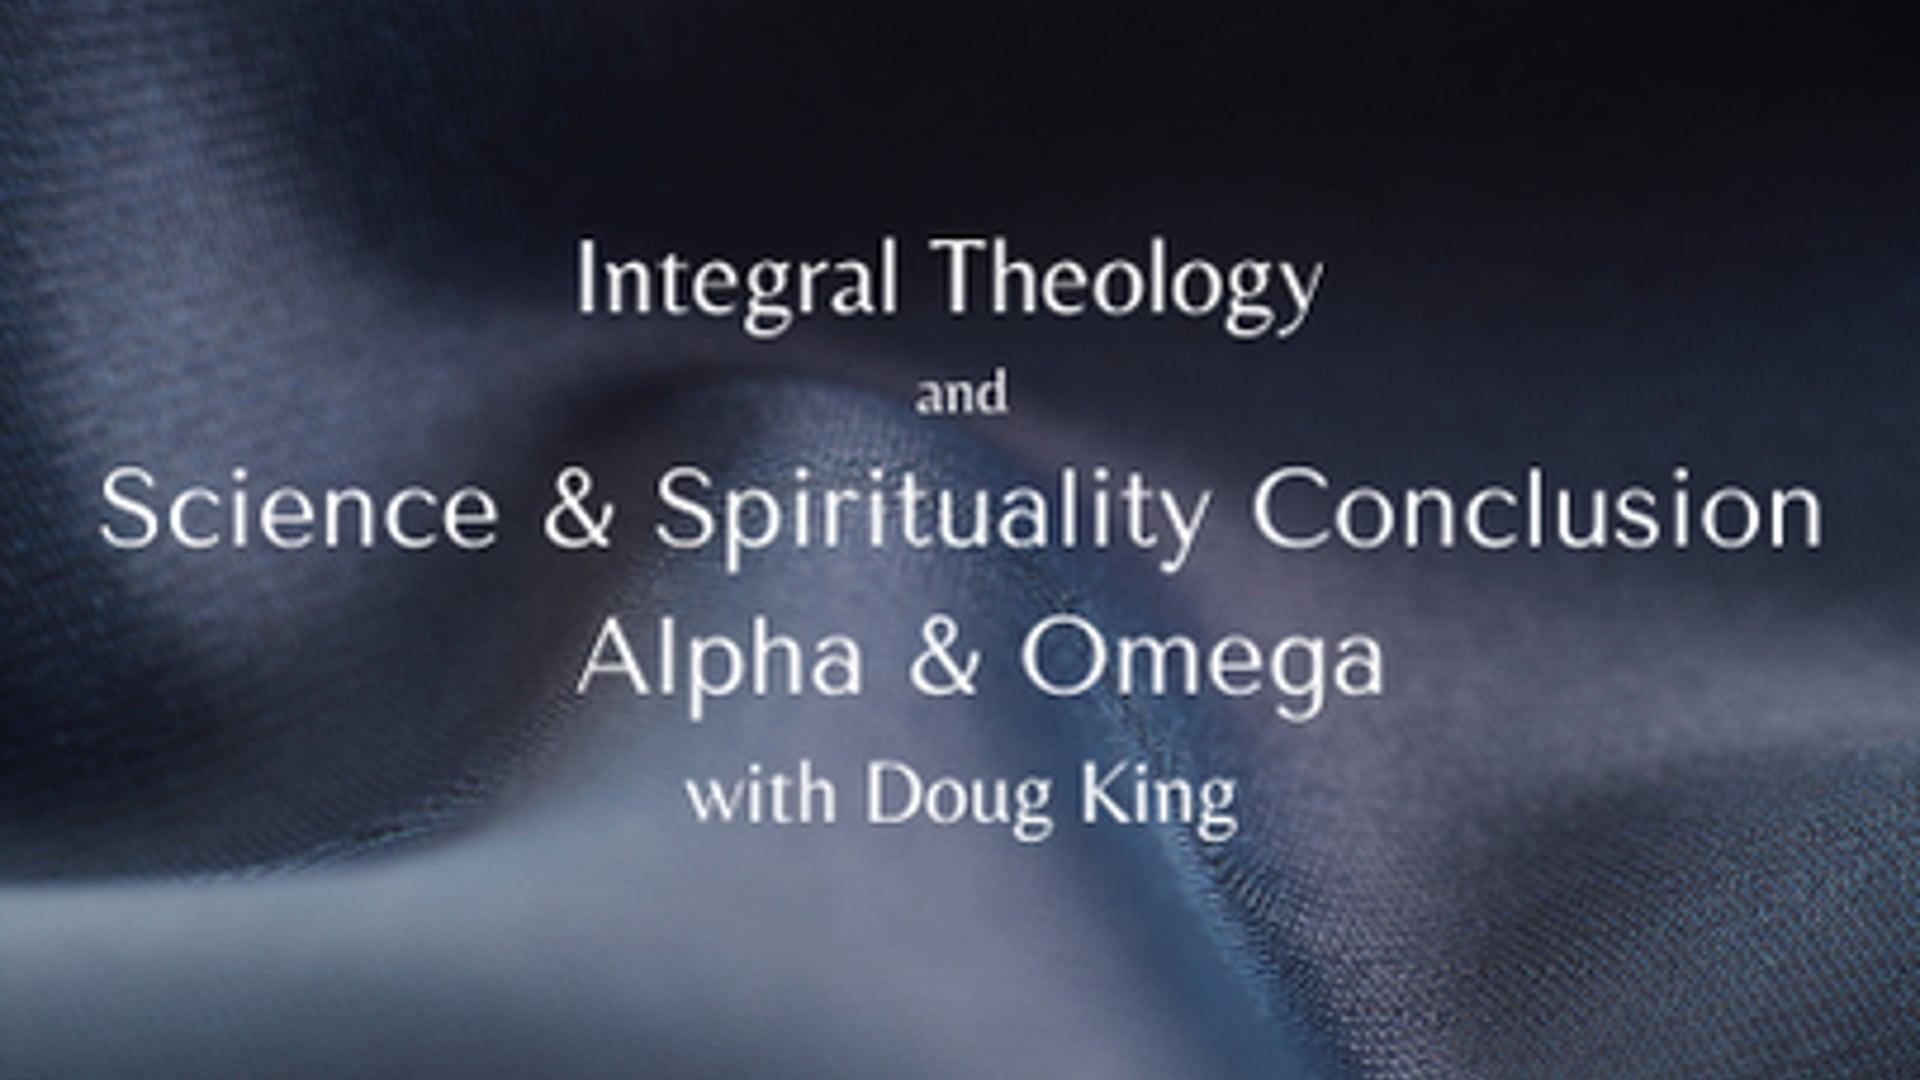 Science & Spirituality - Alpha & Omega